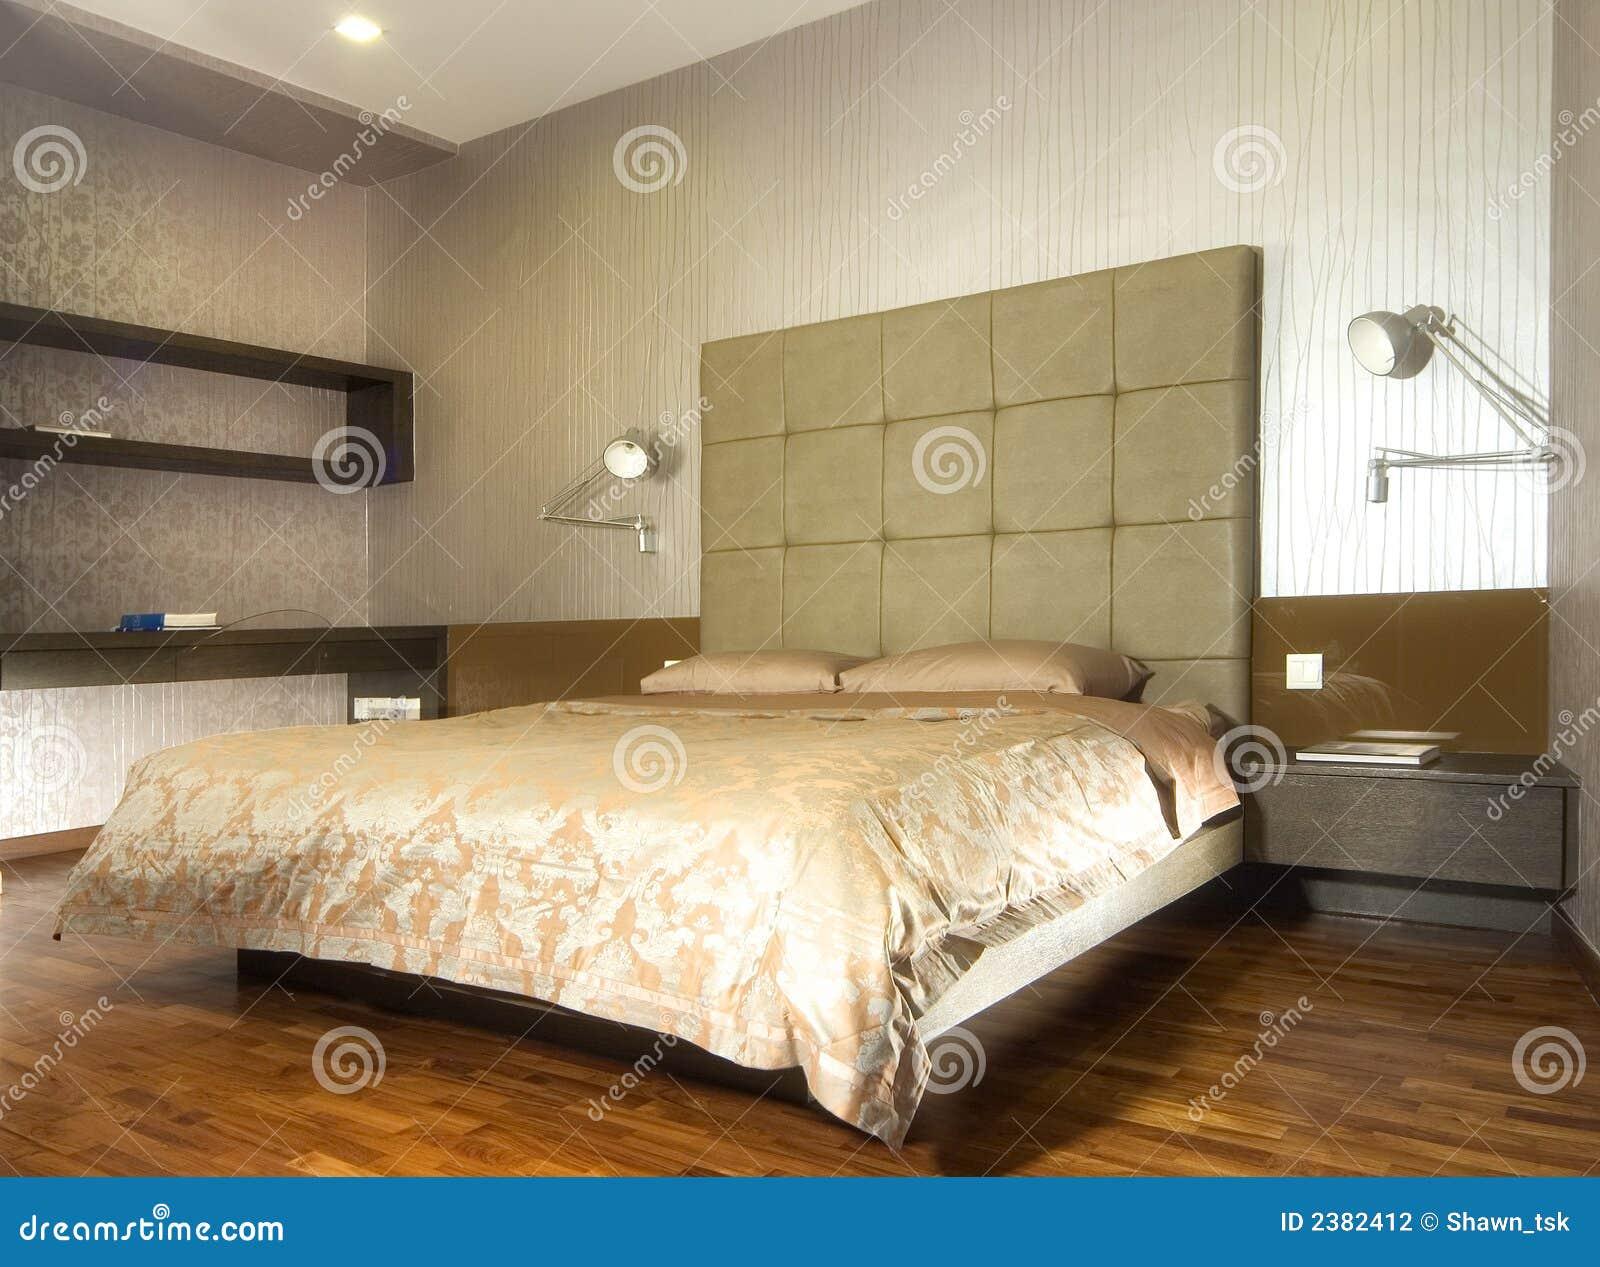 Dise o interior dormitorio fotograf a de archivo - Diseno dormitorio ...